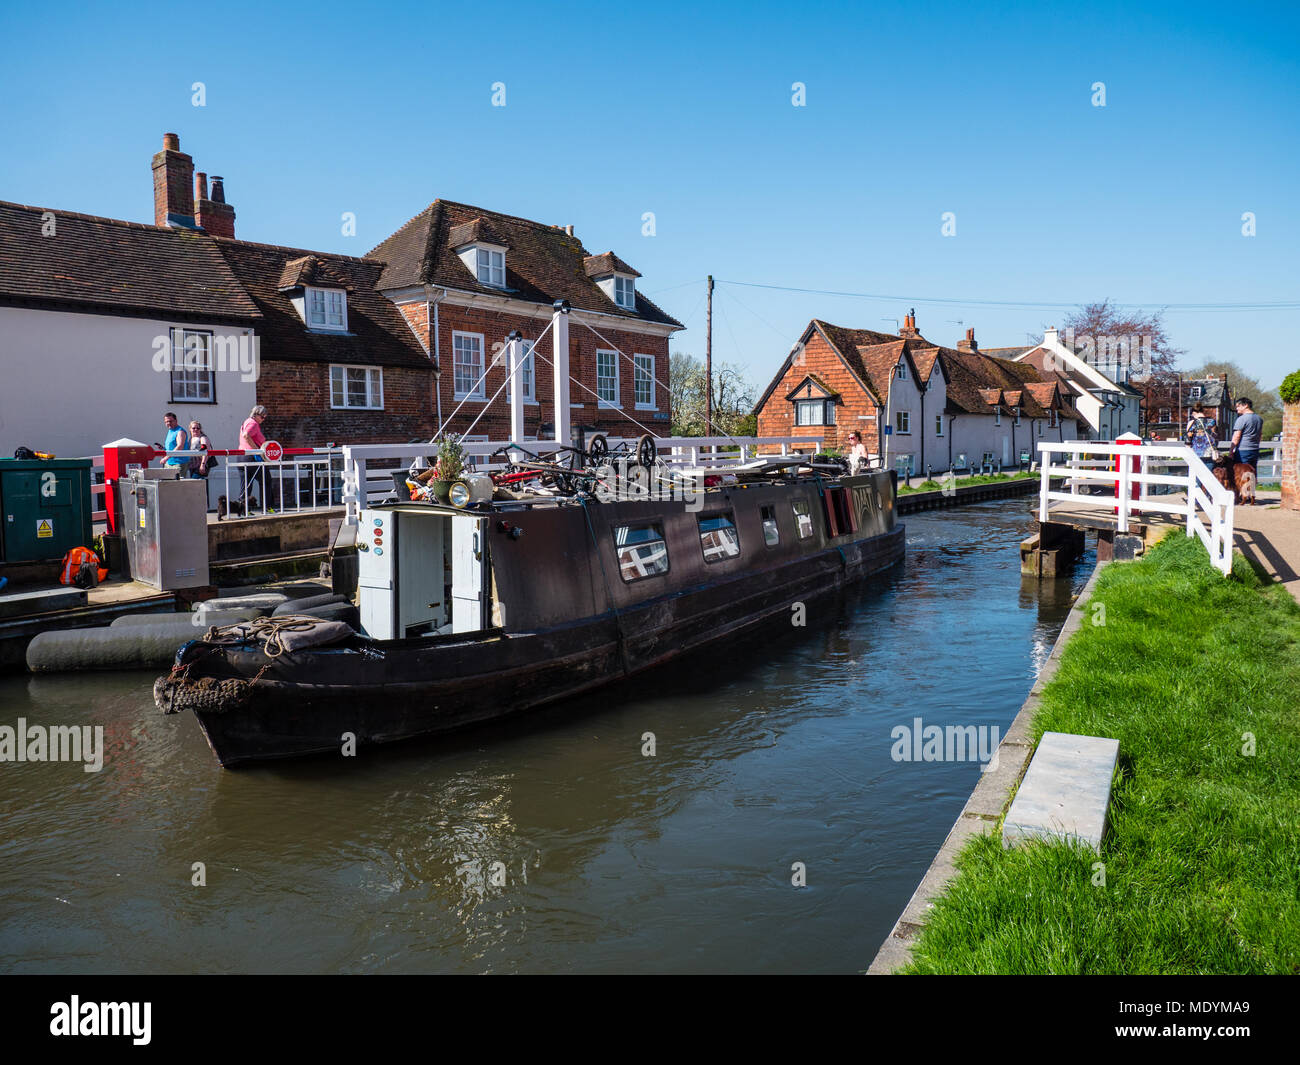 Narrow Boat Passing, Bridge 62 West Mills Swingbridge, River Kennet, Newbury, Berkshire, England, UK, GB. - Stock Image